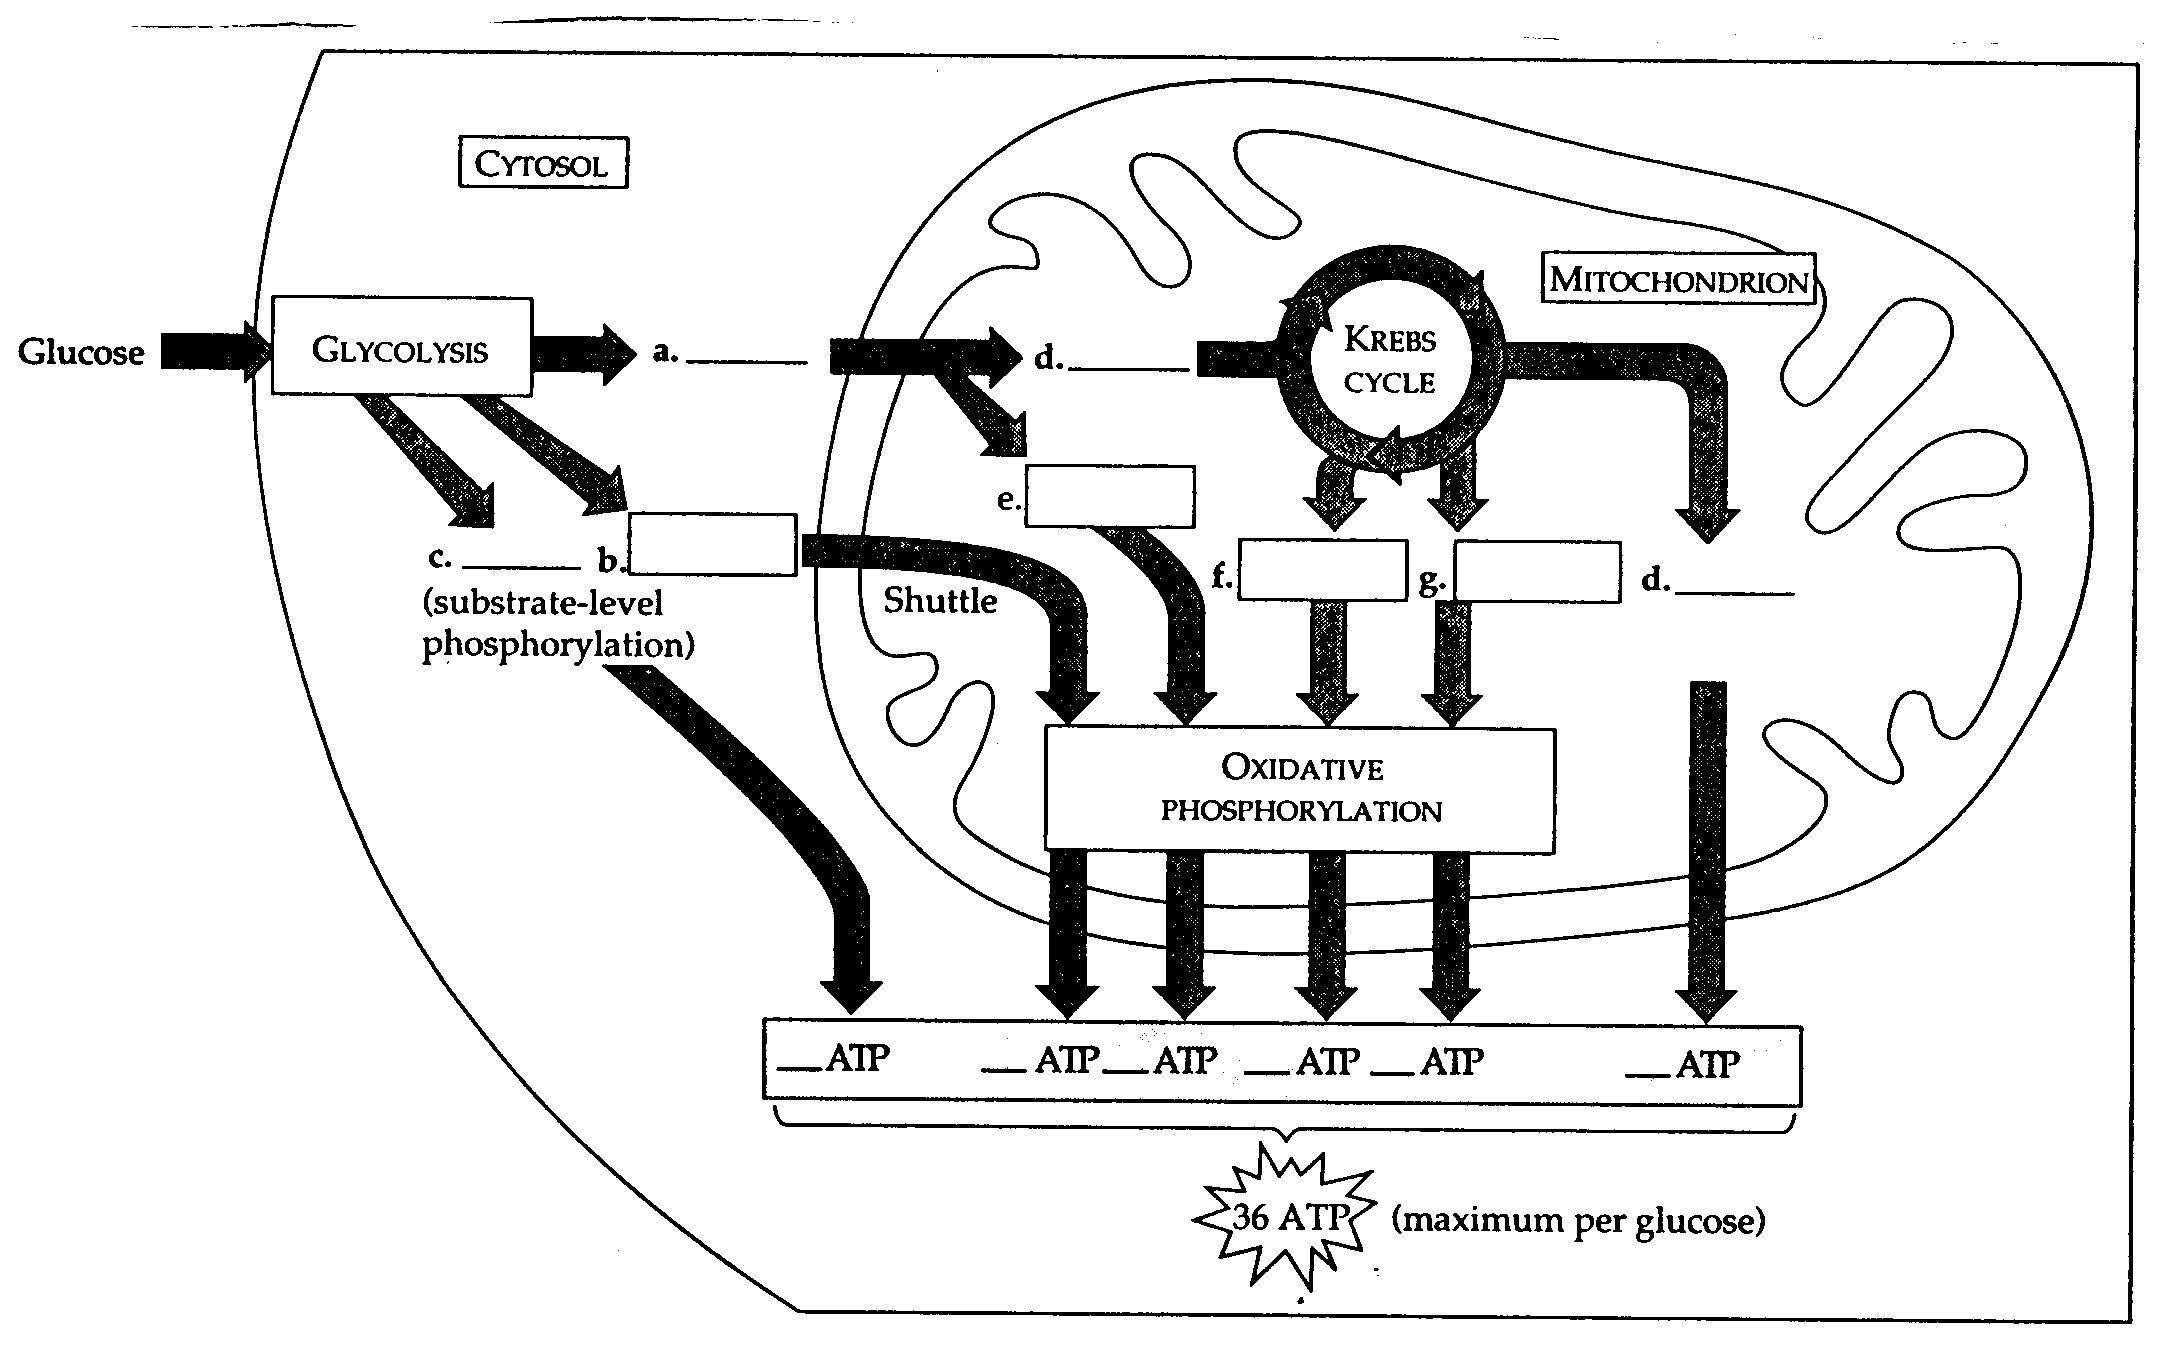 Cellular Respiration Activity Worksheet Cellular Respiration Diagram Worksheet Blank In 2020 Cellular Respiration Biology Worksheet Cellular Respiration Biology